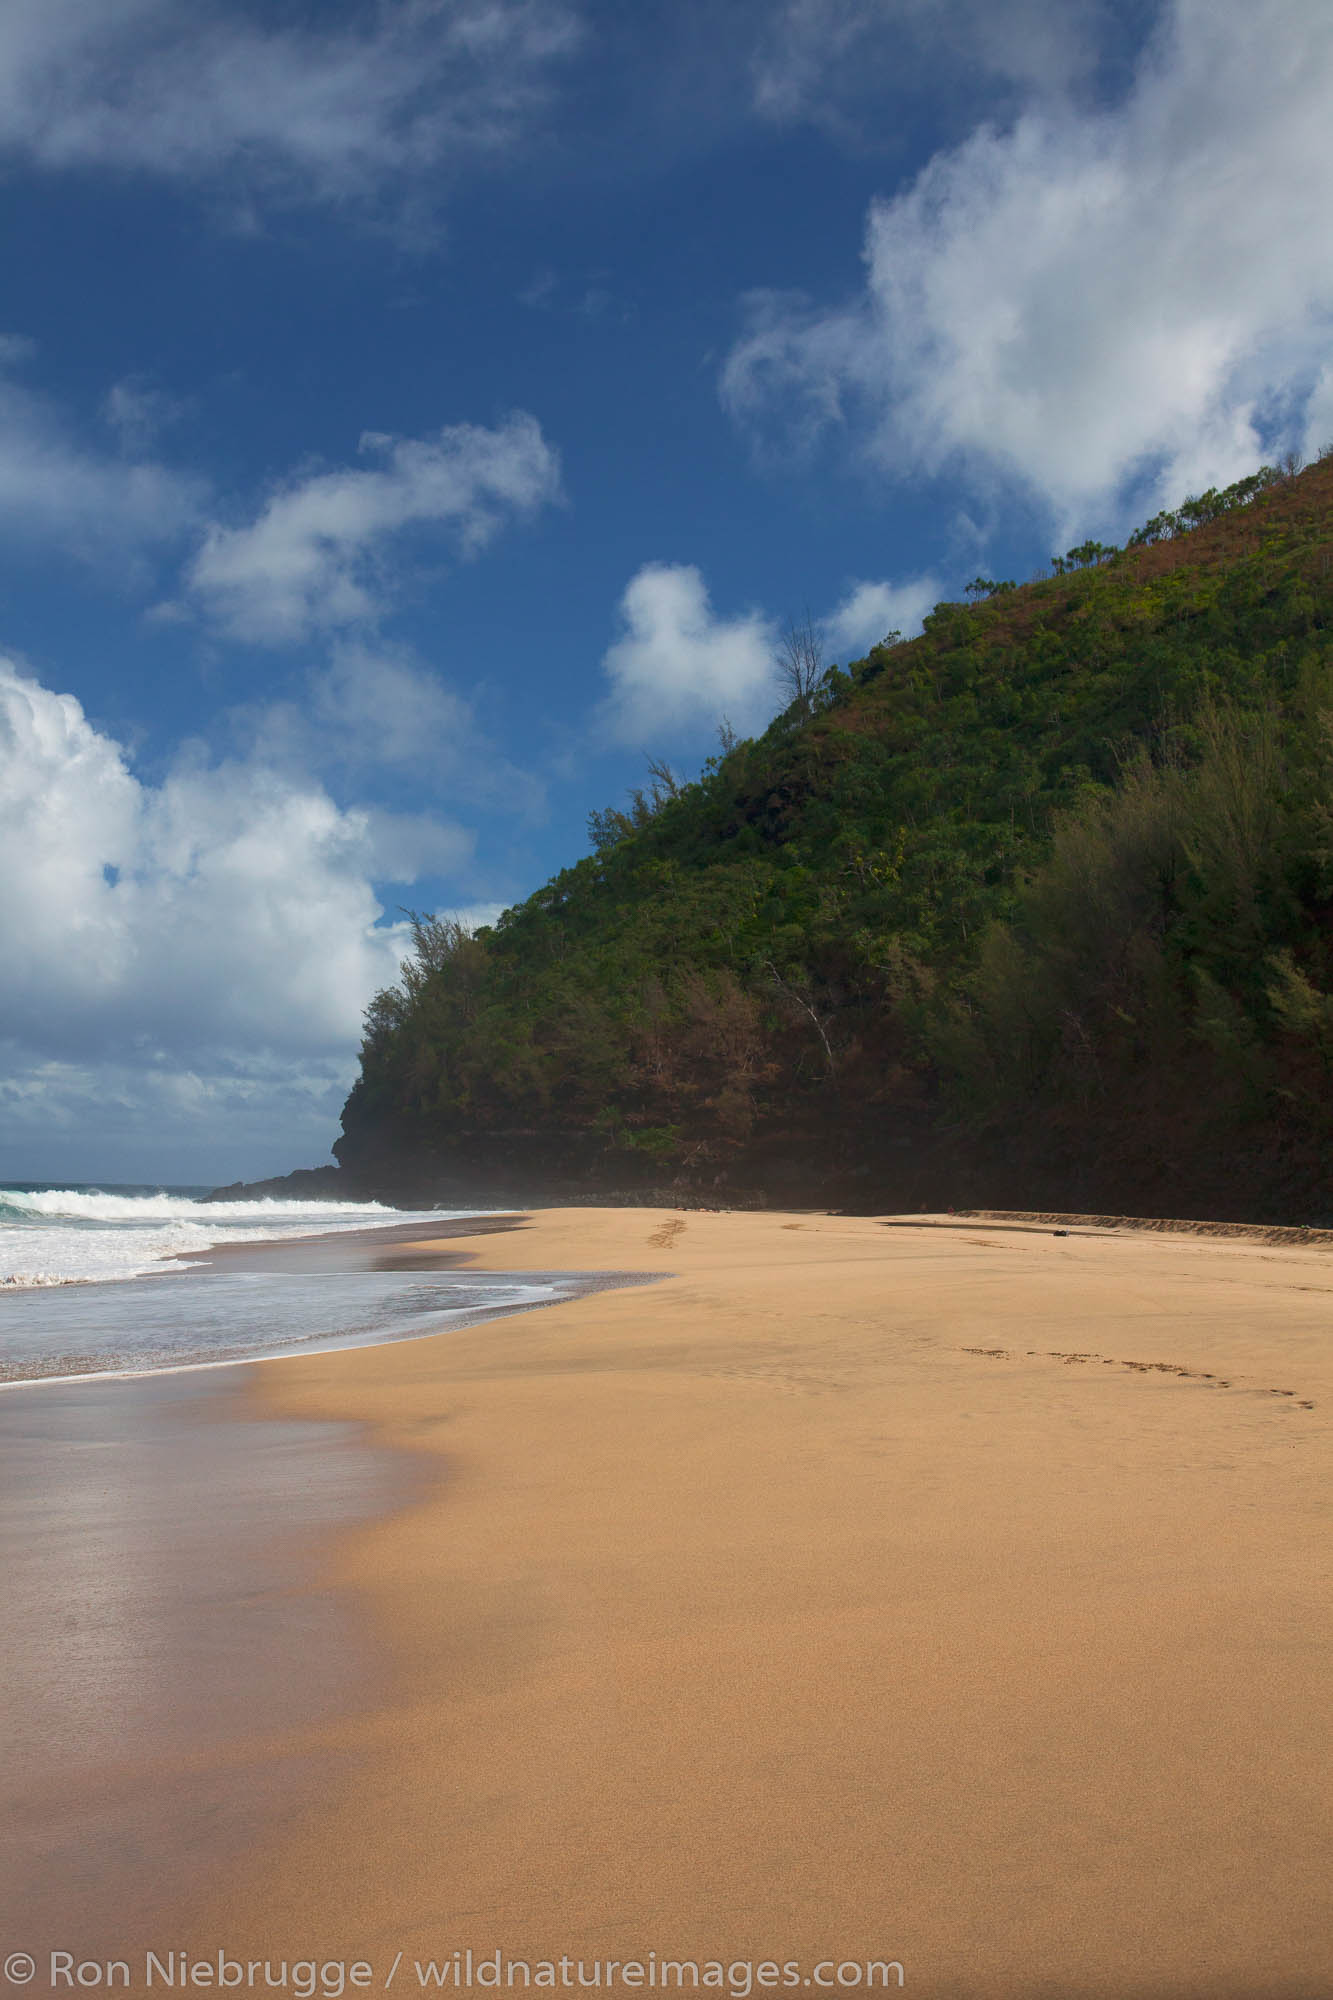 Hanakapi'ai Beach and the Na Pali Coast from the KalalauTrail, Kauai, Hawaii.